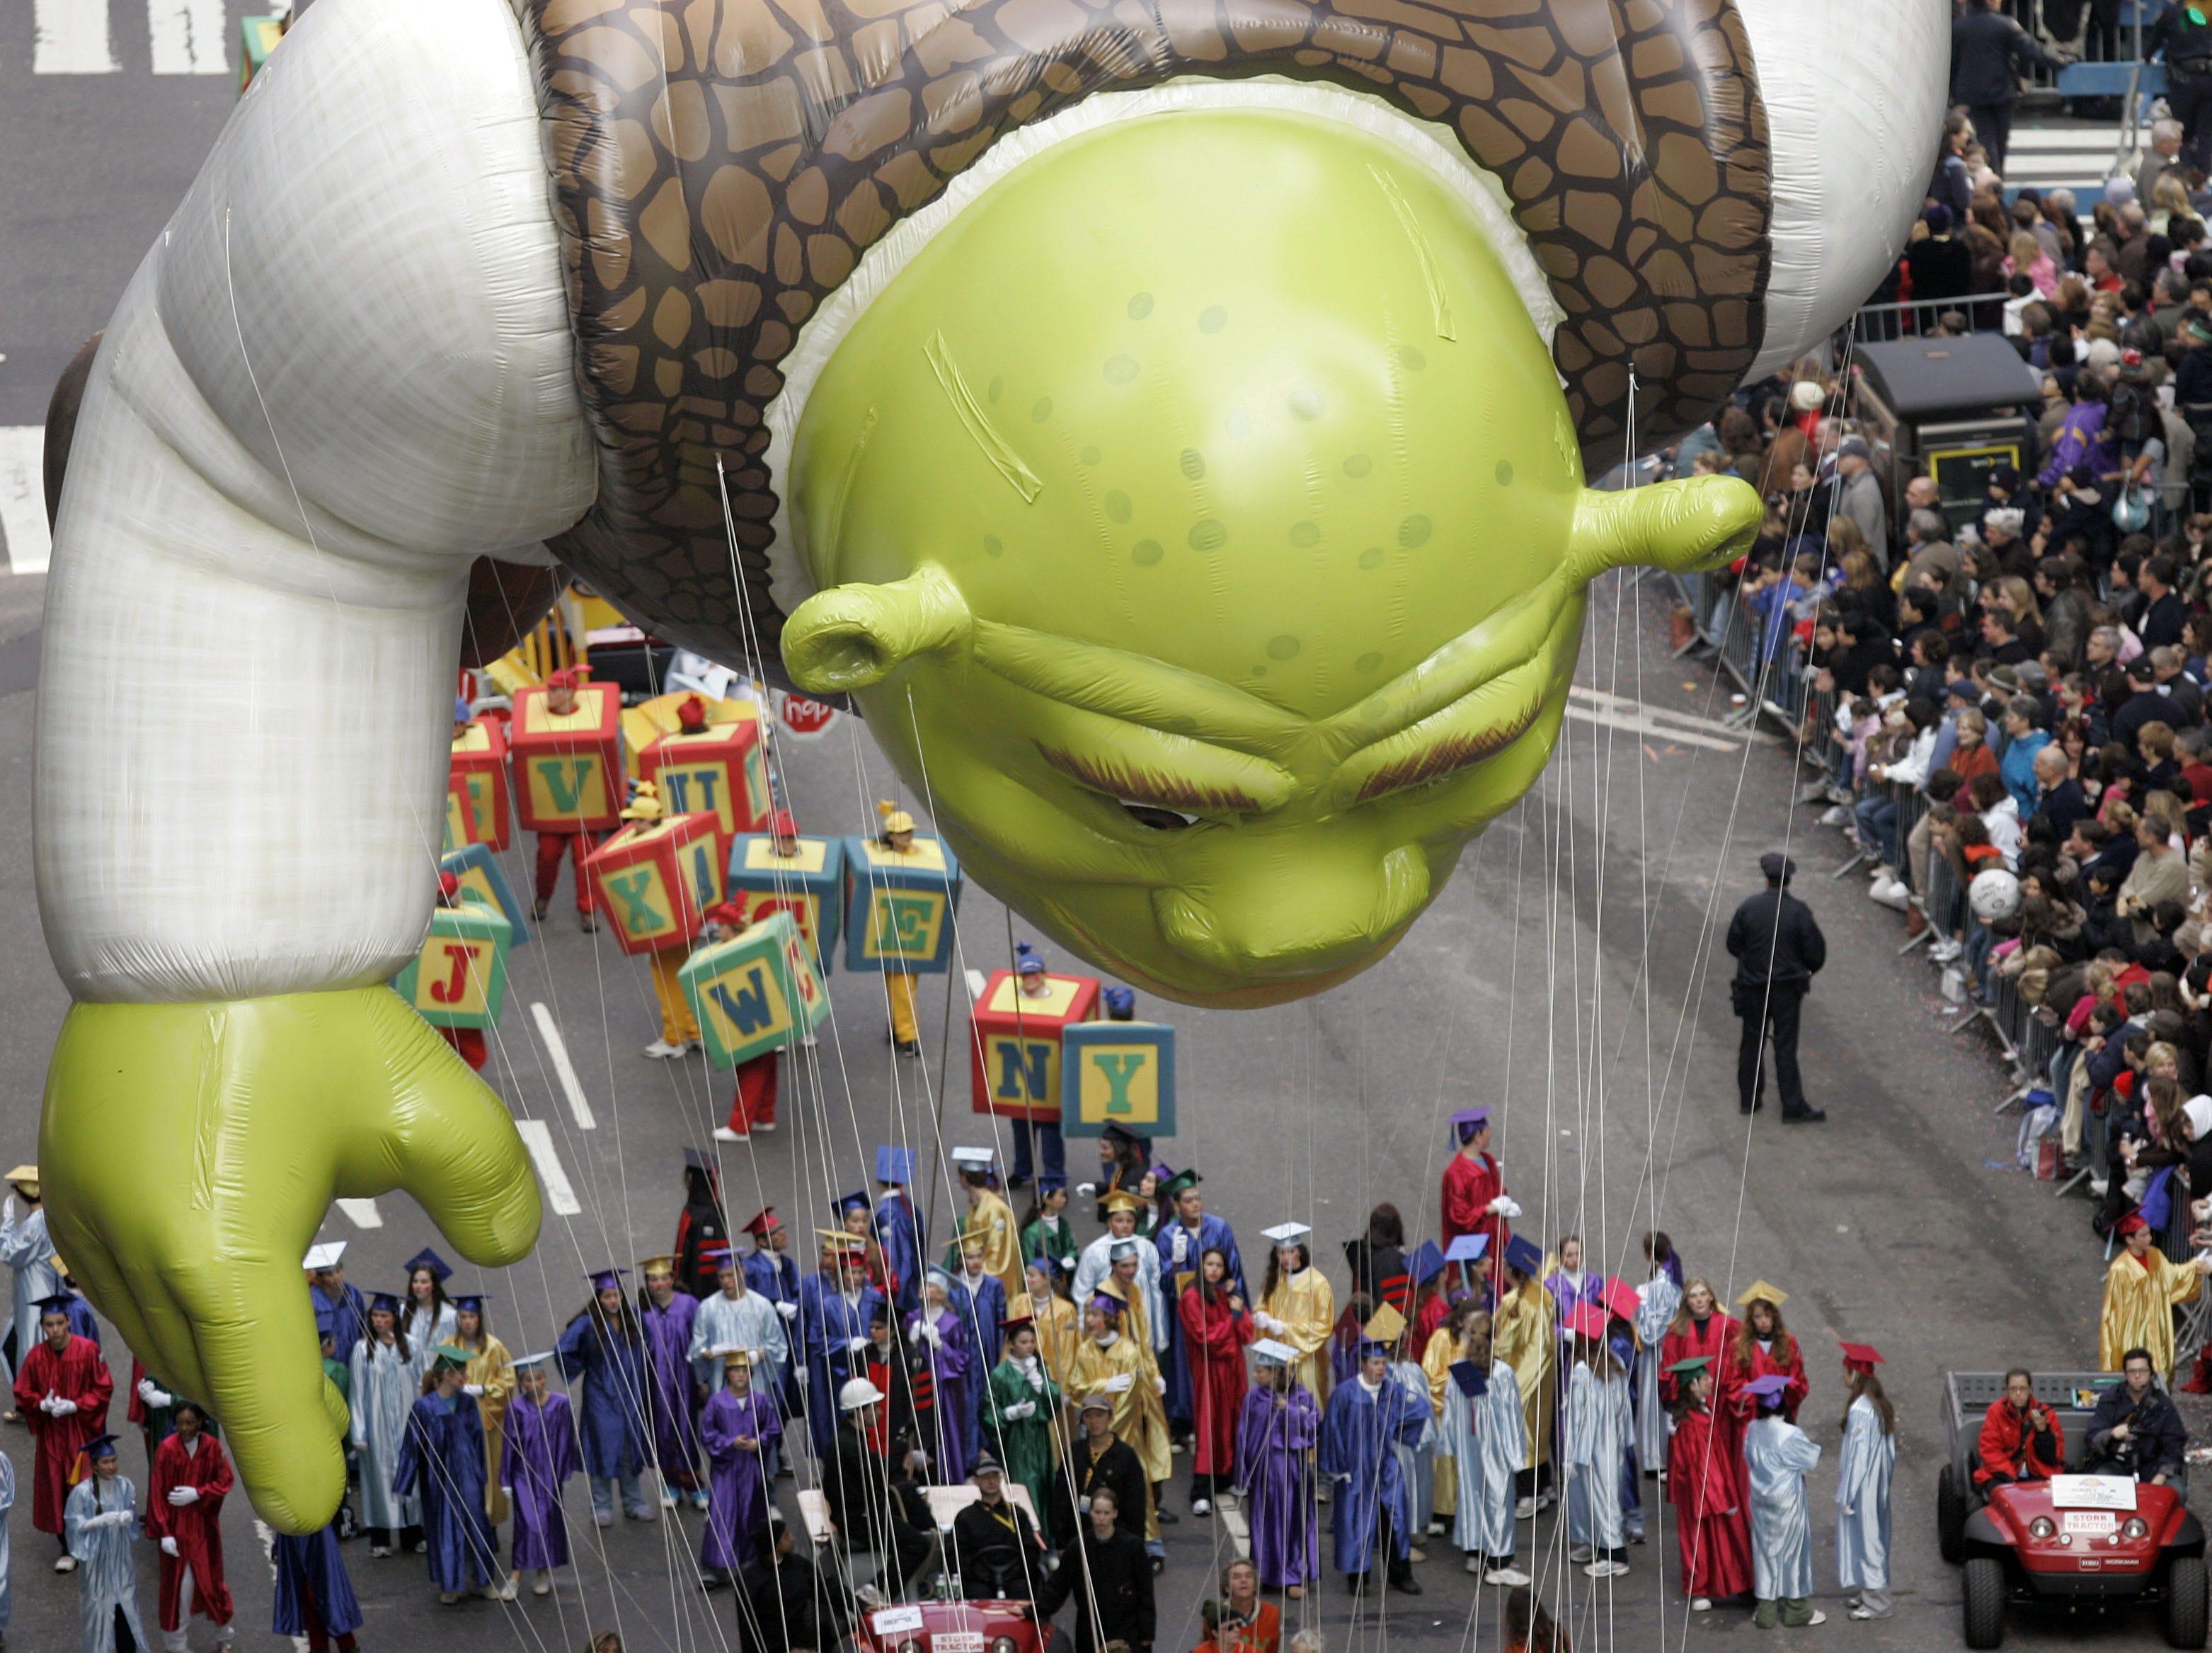 The Shrek balloon floats down Broadway during the Macy's Thanksgiving Day parade in New York, Thursday, Nov. 22, 2007.  (AP Photo/Jeff Christensen)